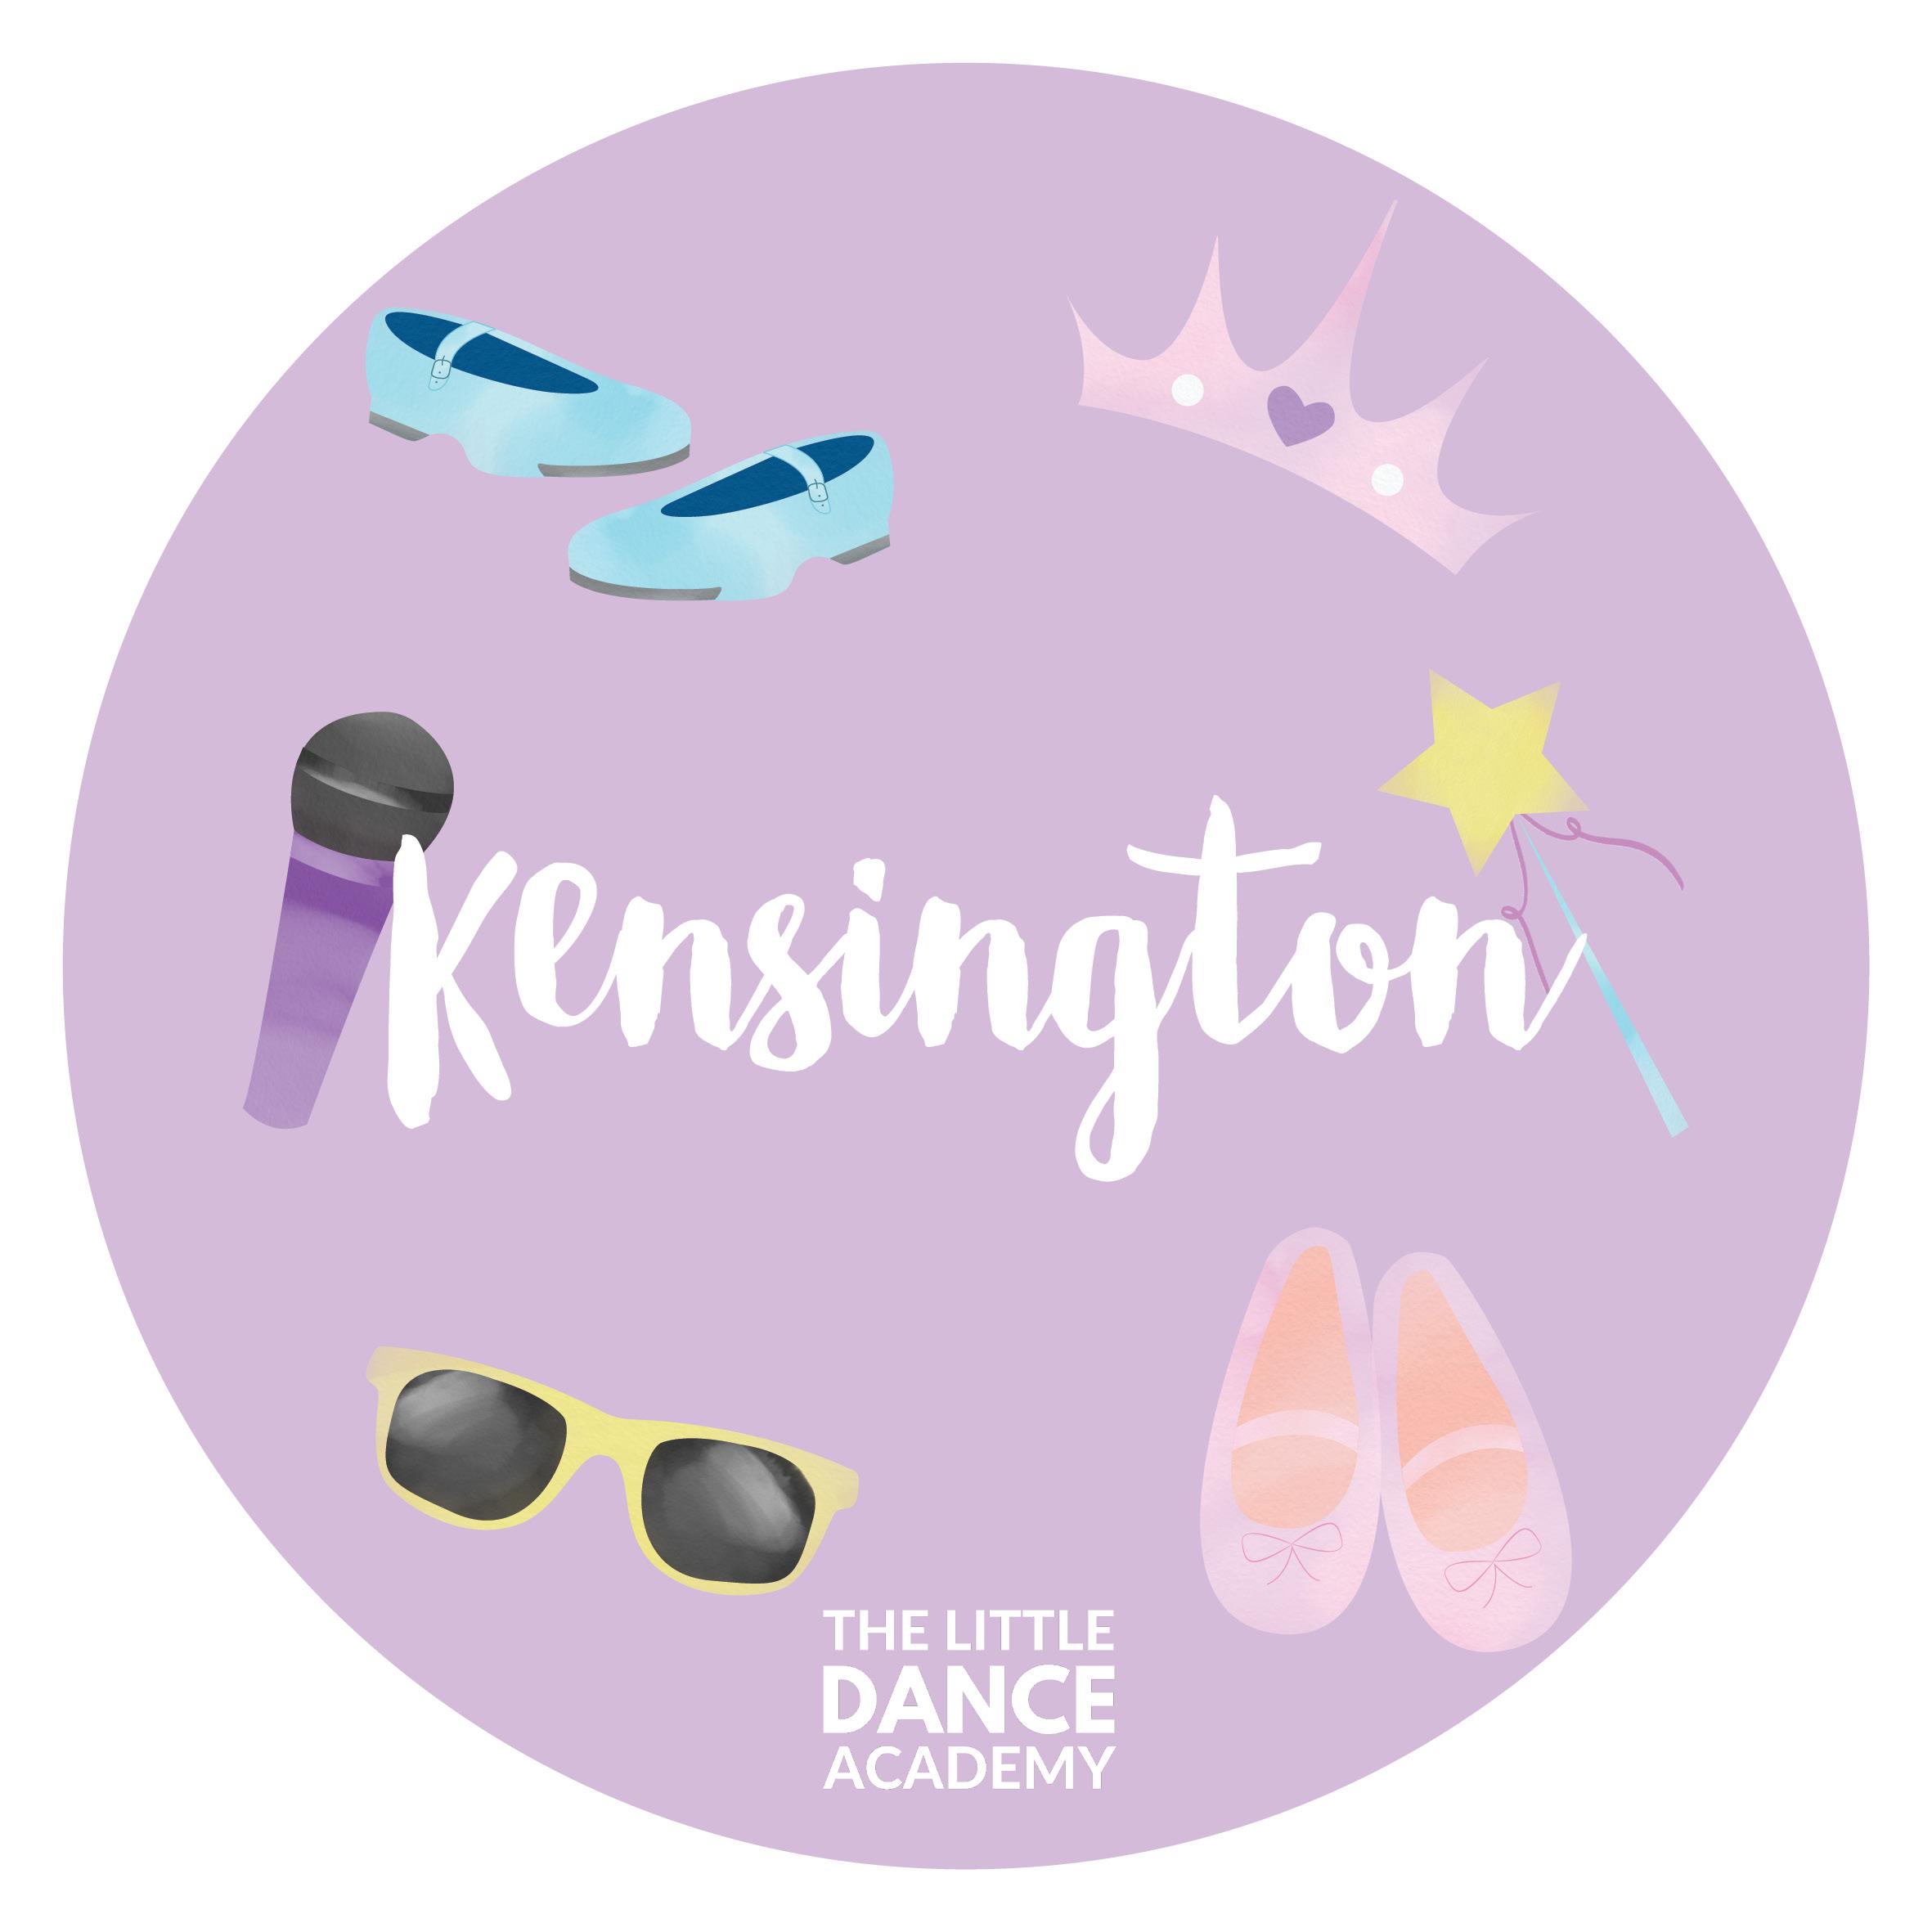 Kensington Dance School